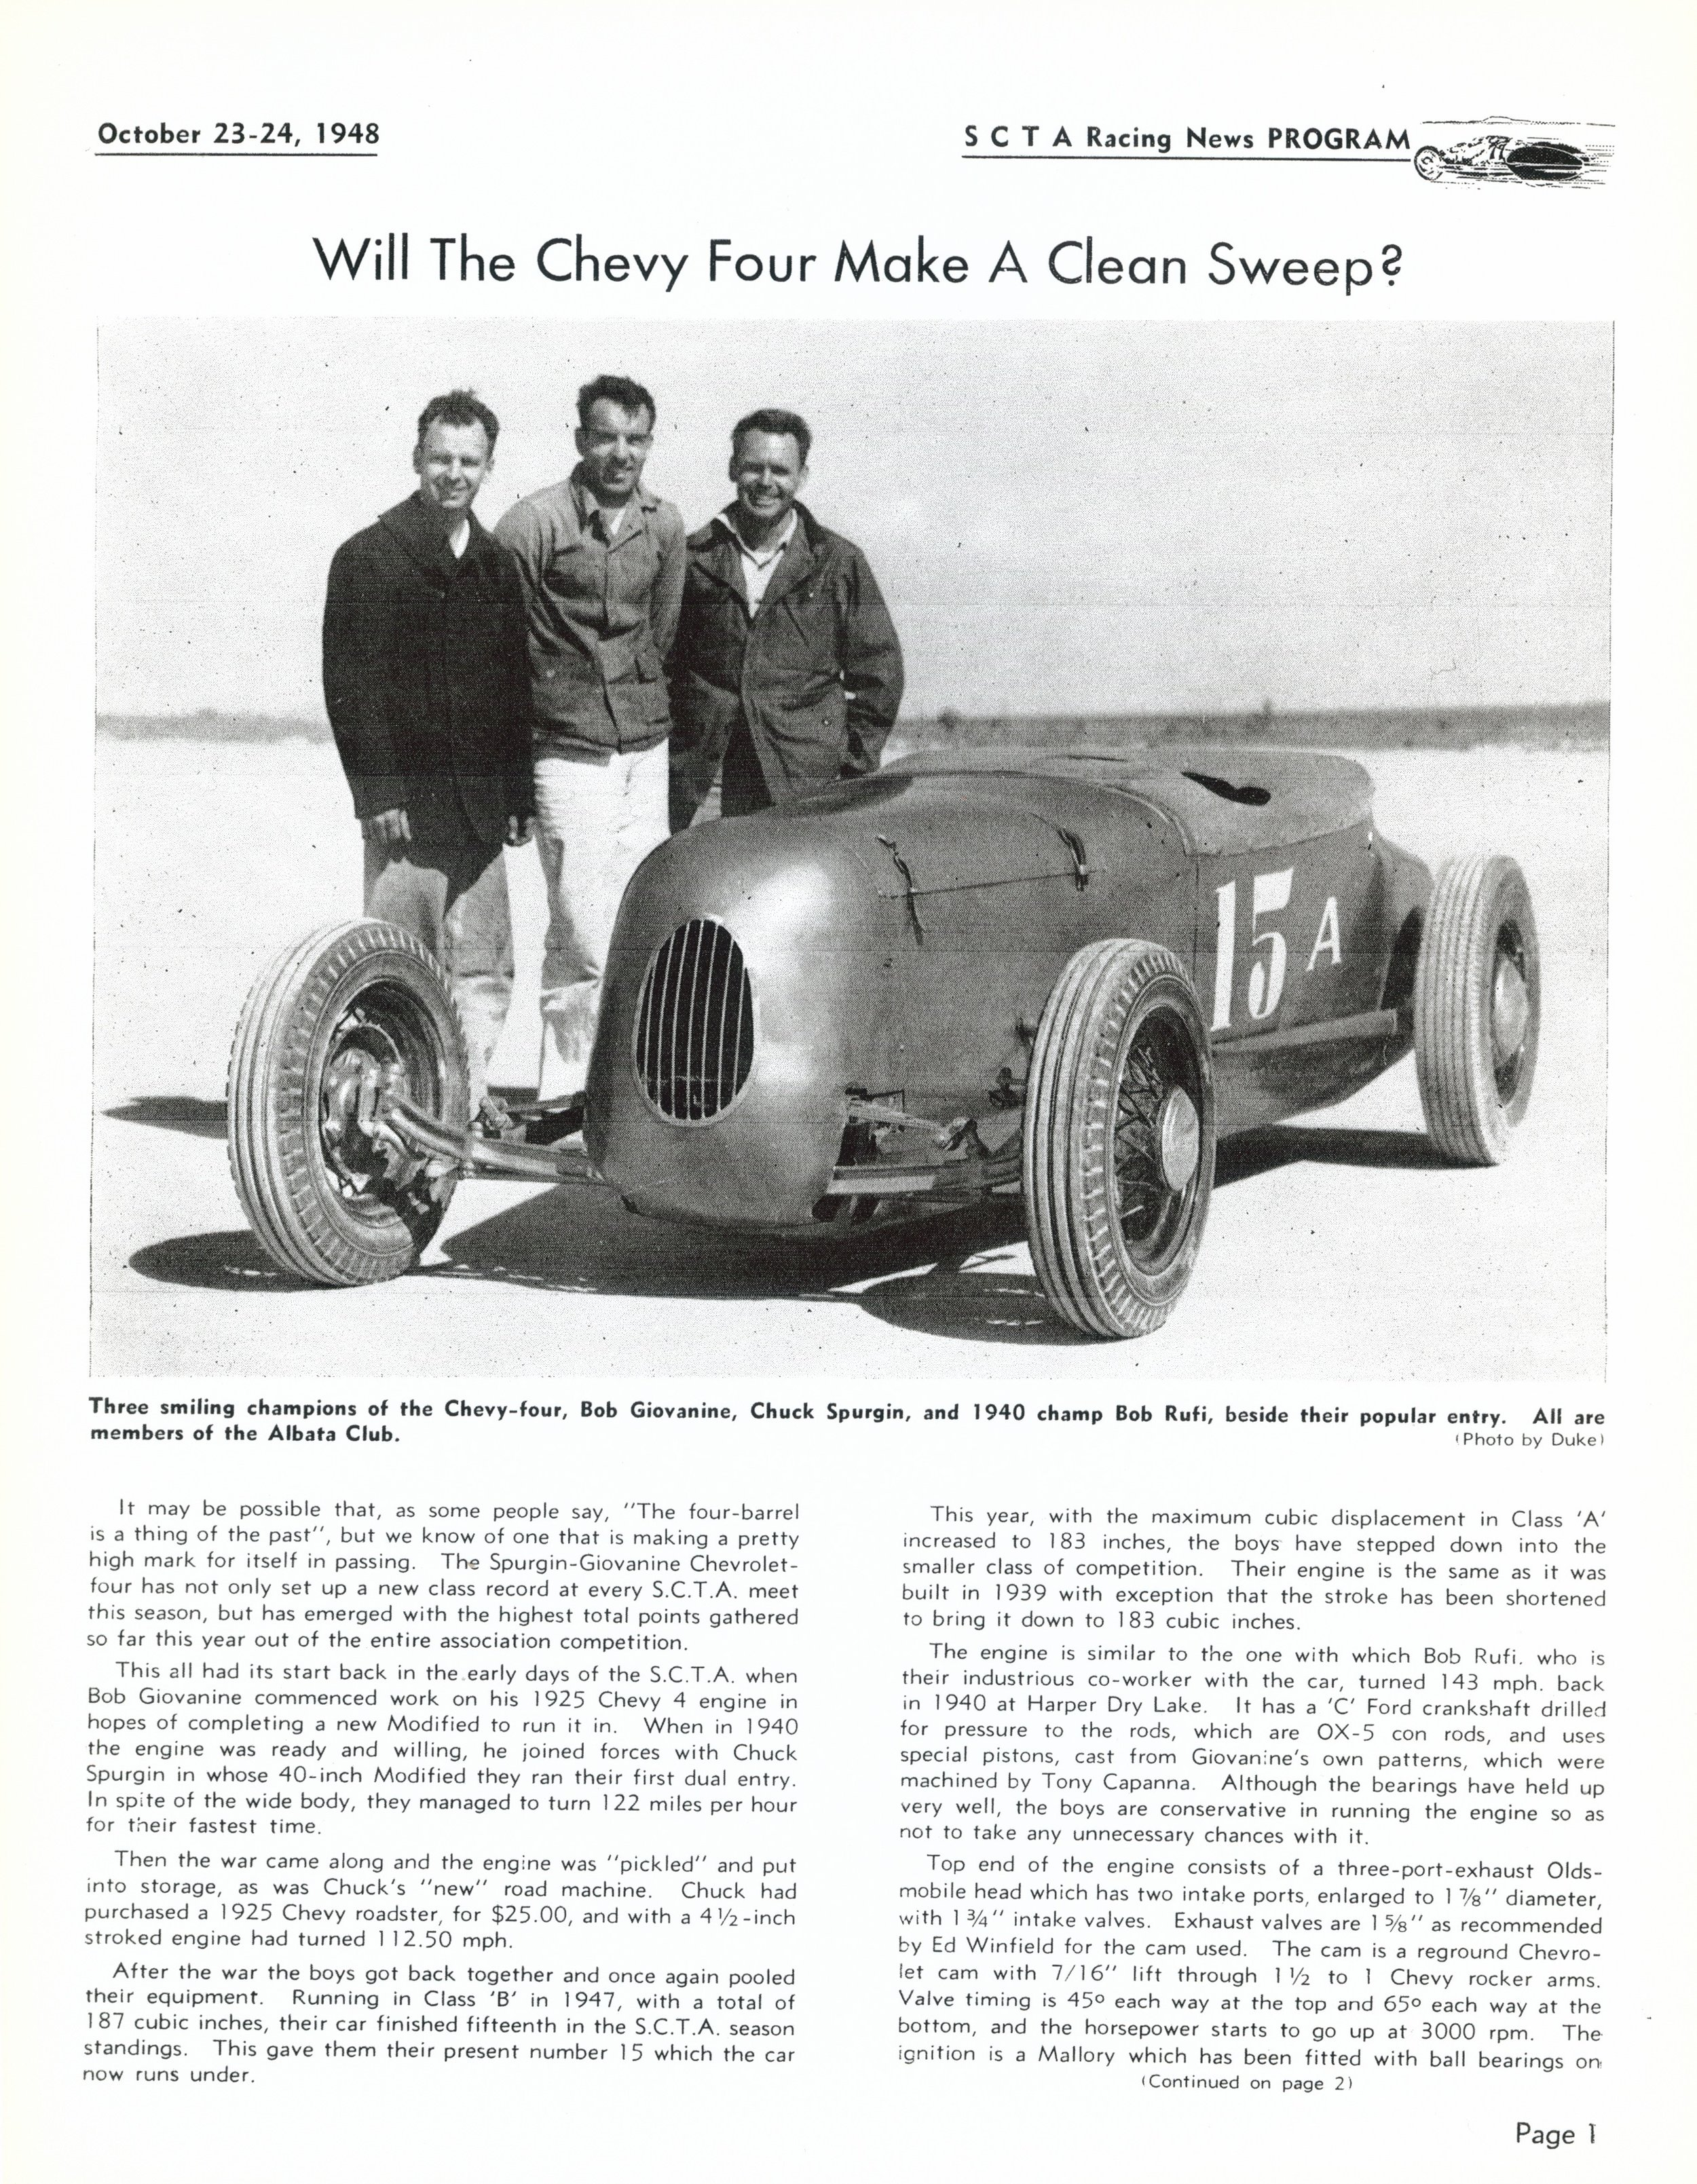 1948 SCTA Racing News Program pg 01.jpg